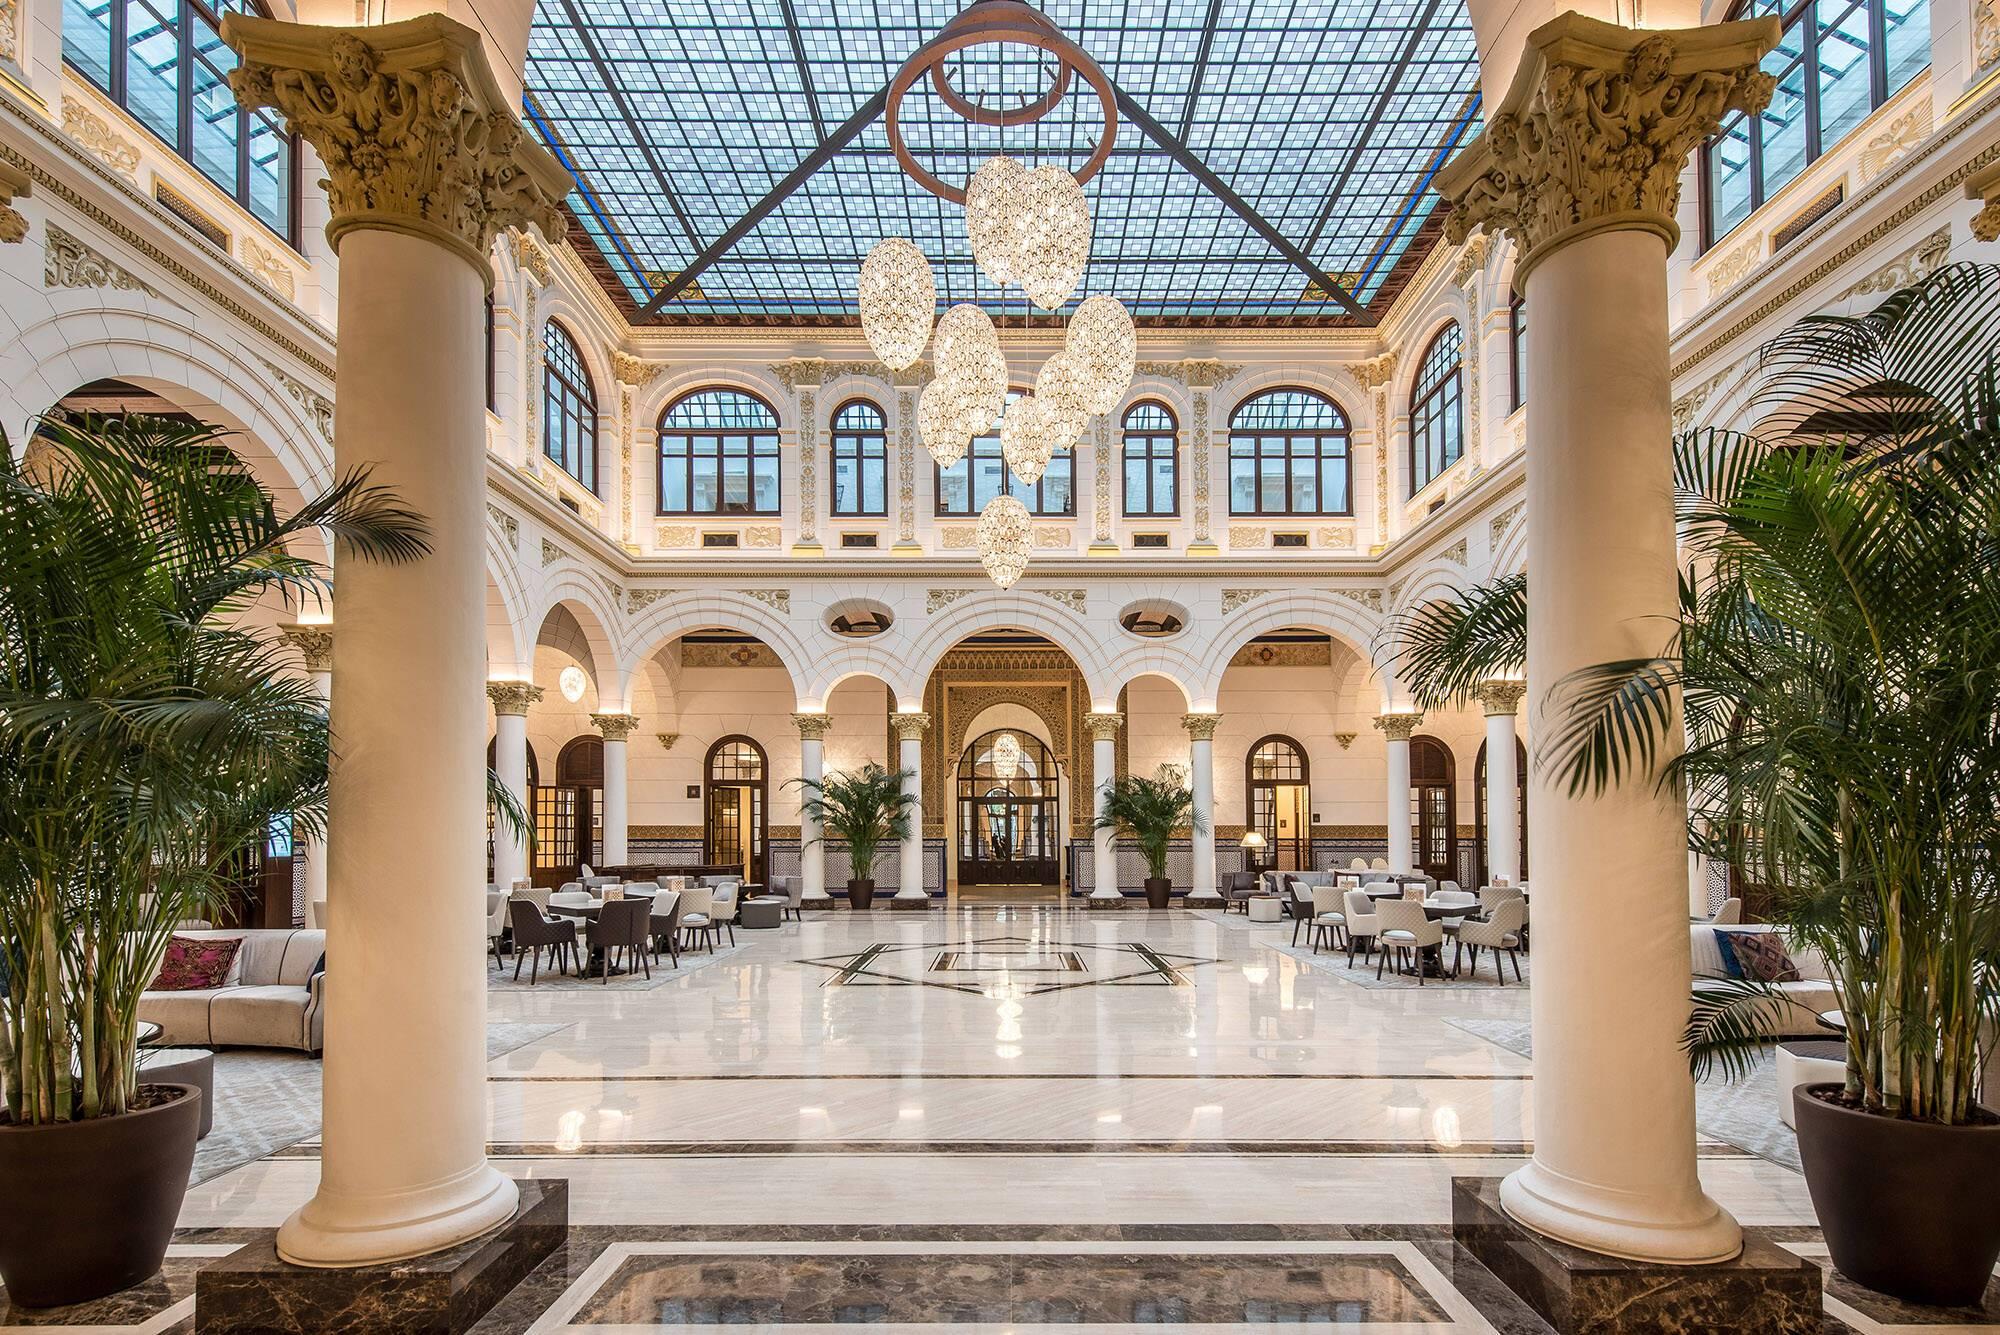 Malaga Gran Hotel Miramar Lobby